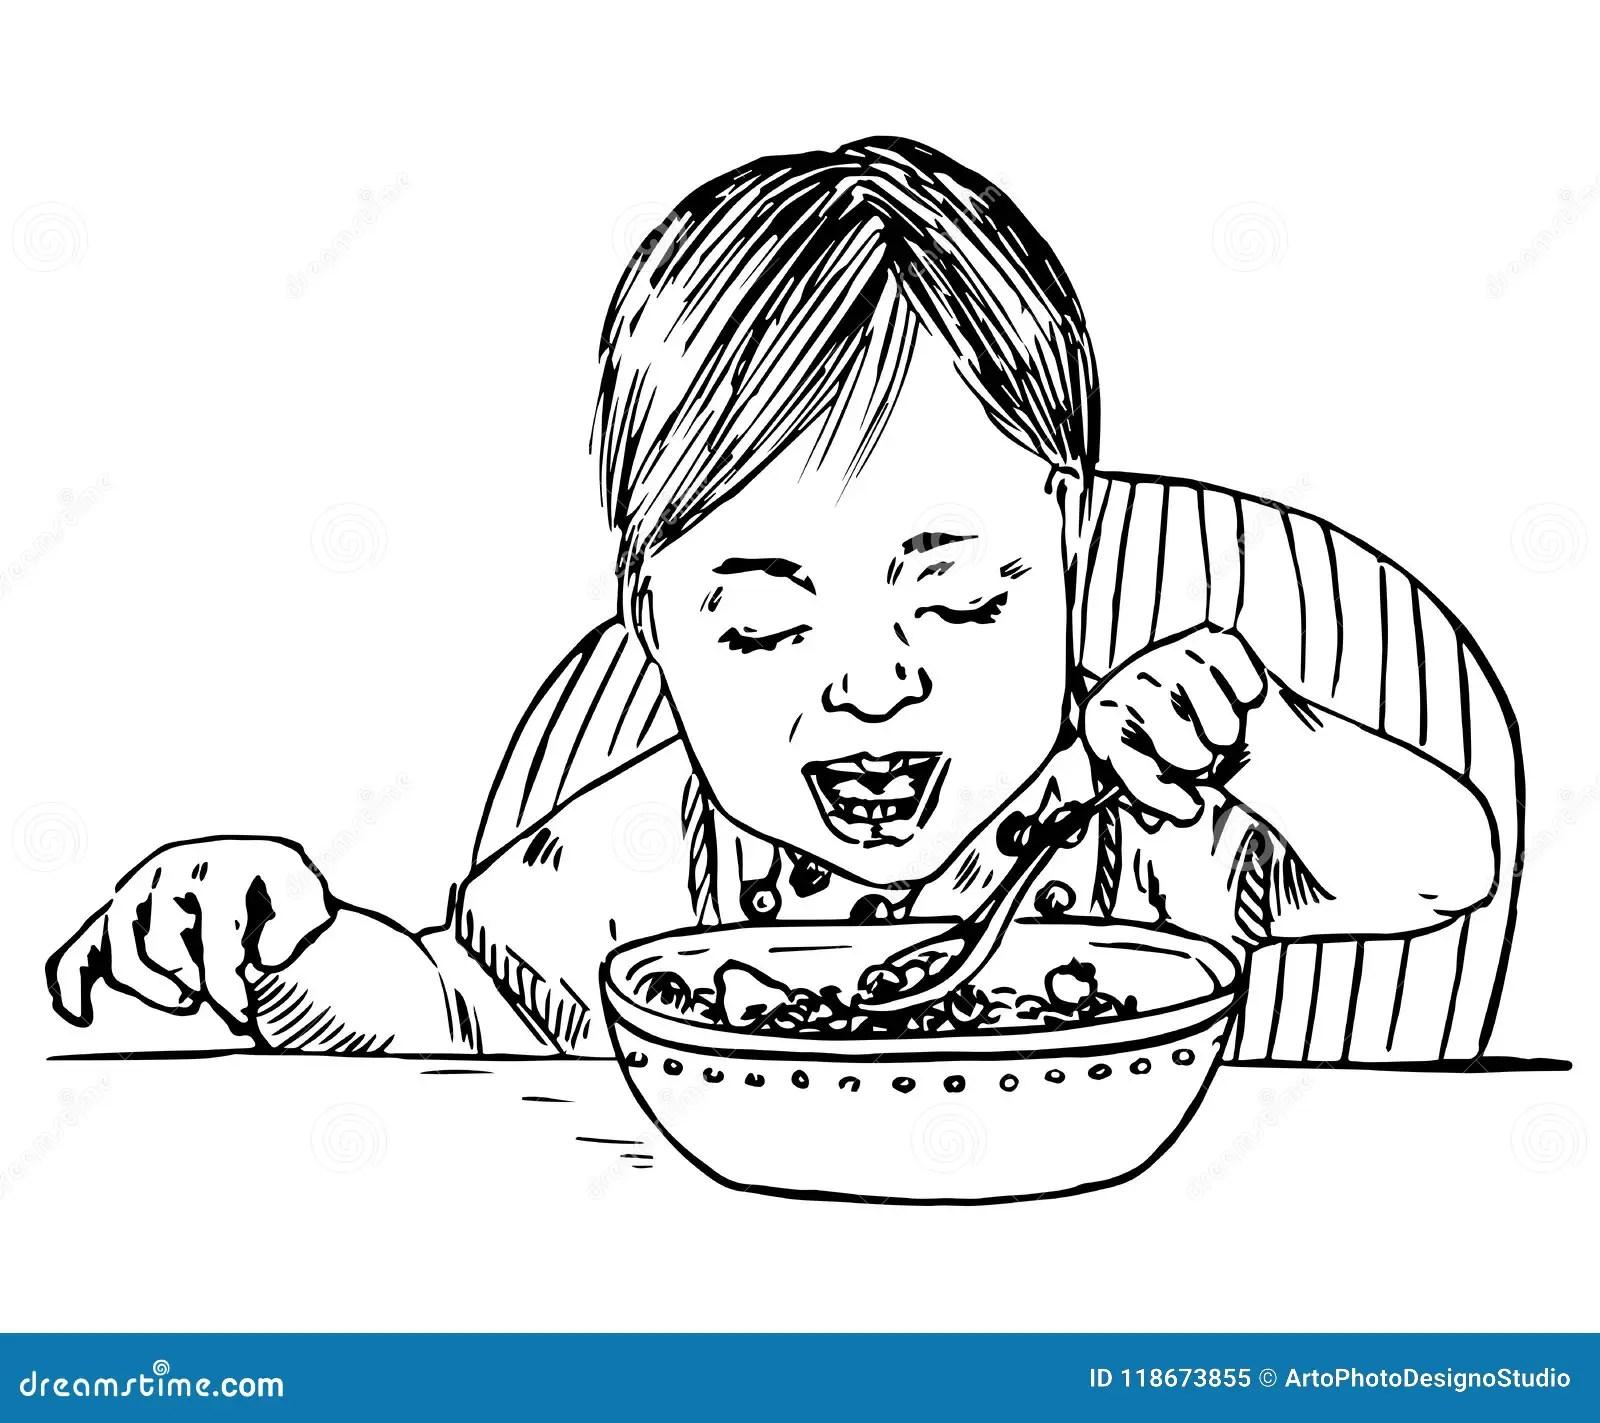 Baby Girl Sitting And Eating Porridge Spoon In Hand Stock